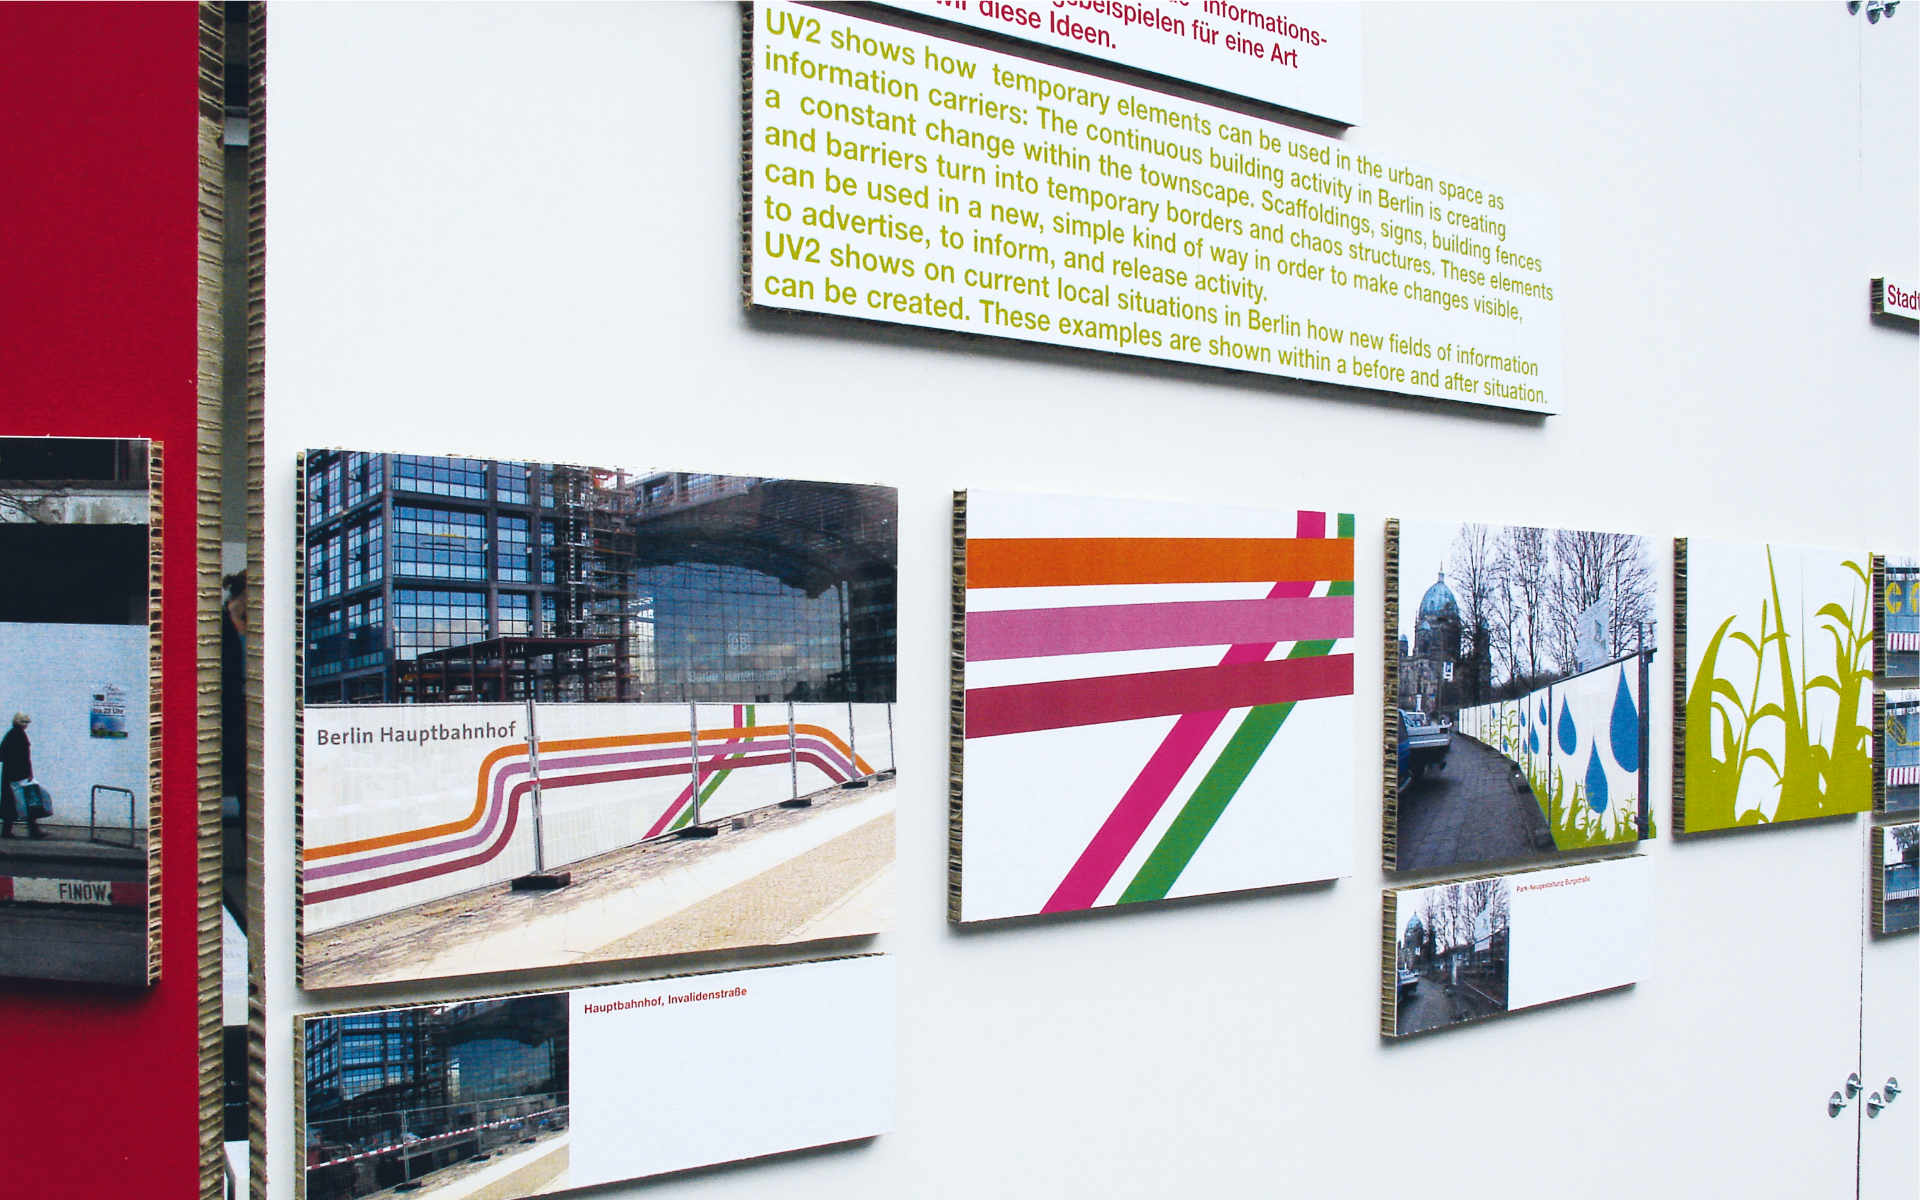 Design Mai Public Design Ausstellungsgestaltung Ausstellungen